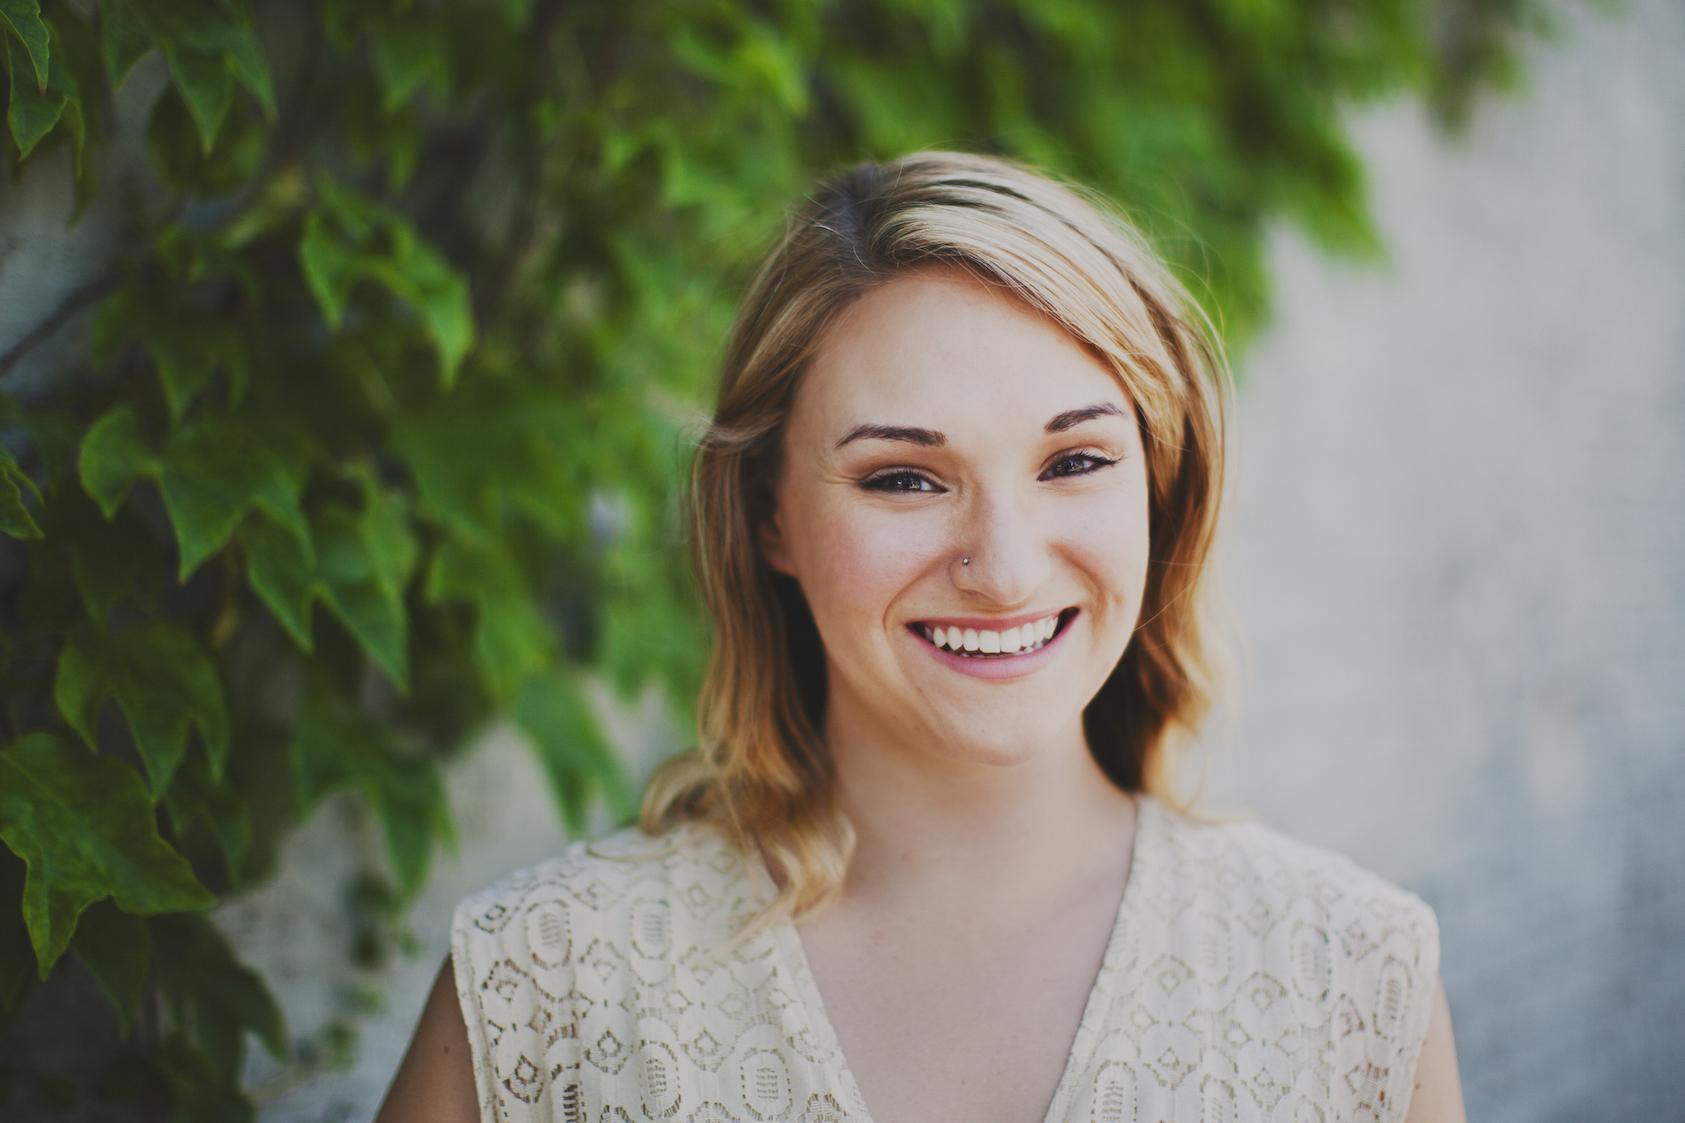 Sarah at Farmers Market shot by Emily Gude 3